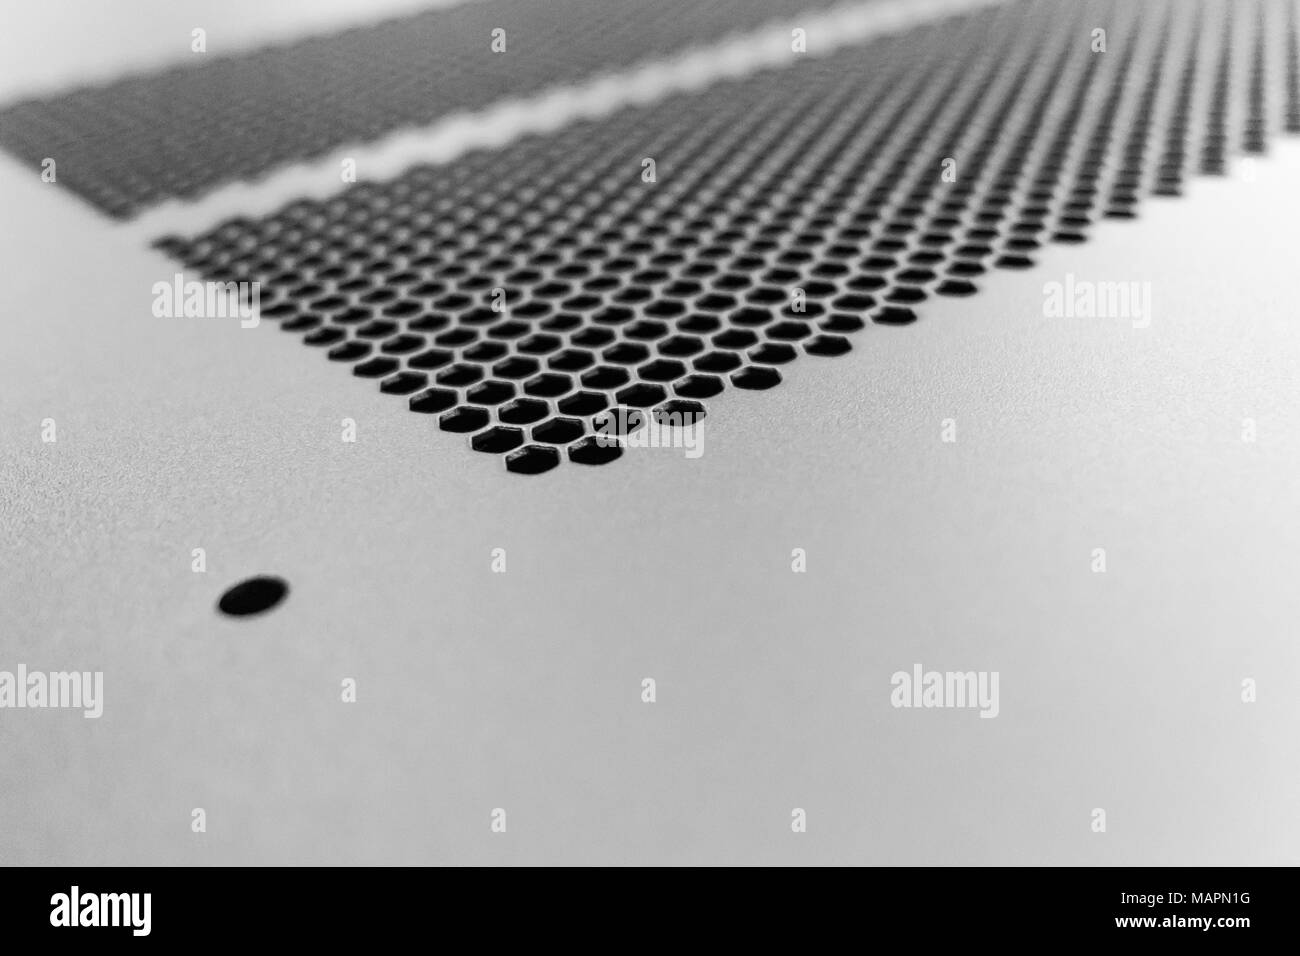 Computer Vent Holes : Vent holes stock photos images alamy